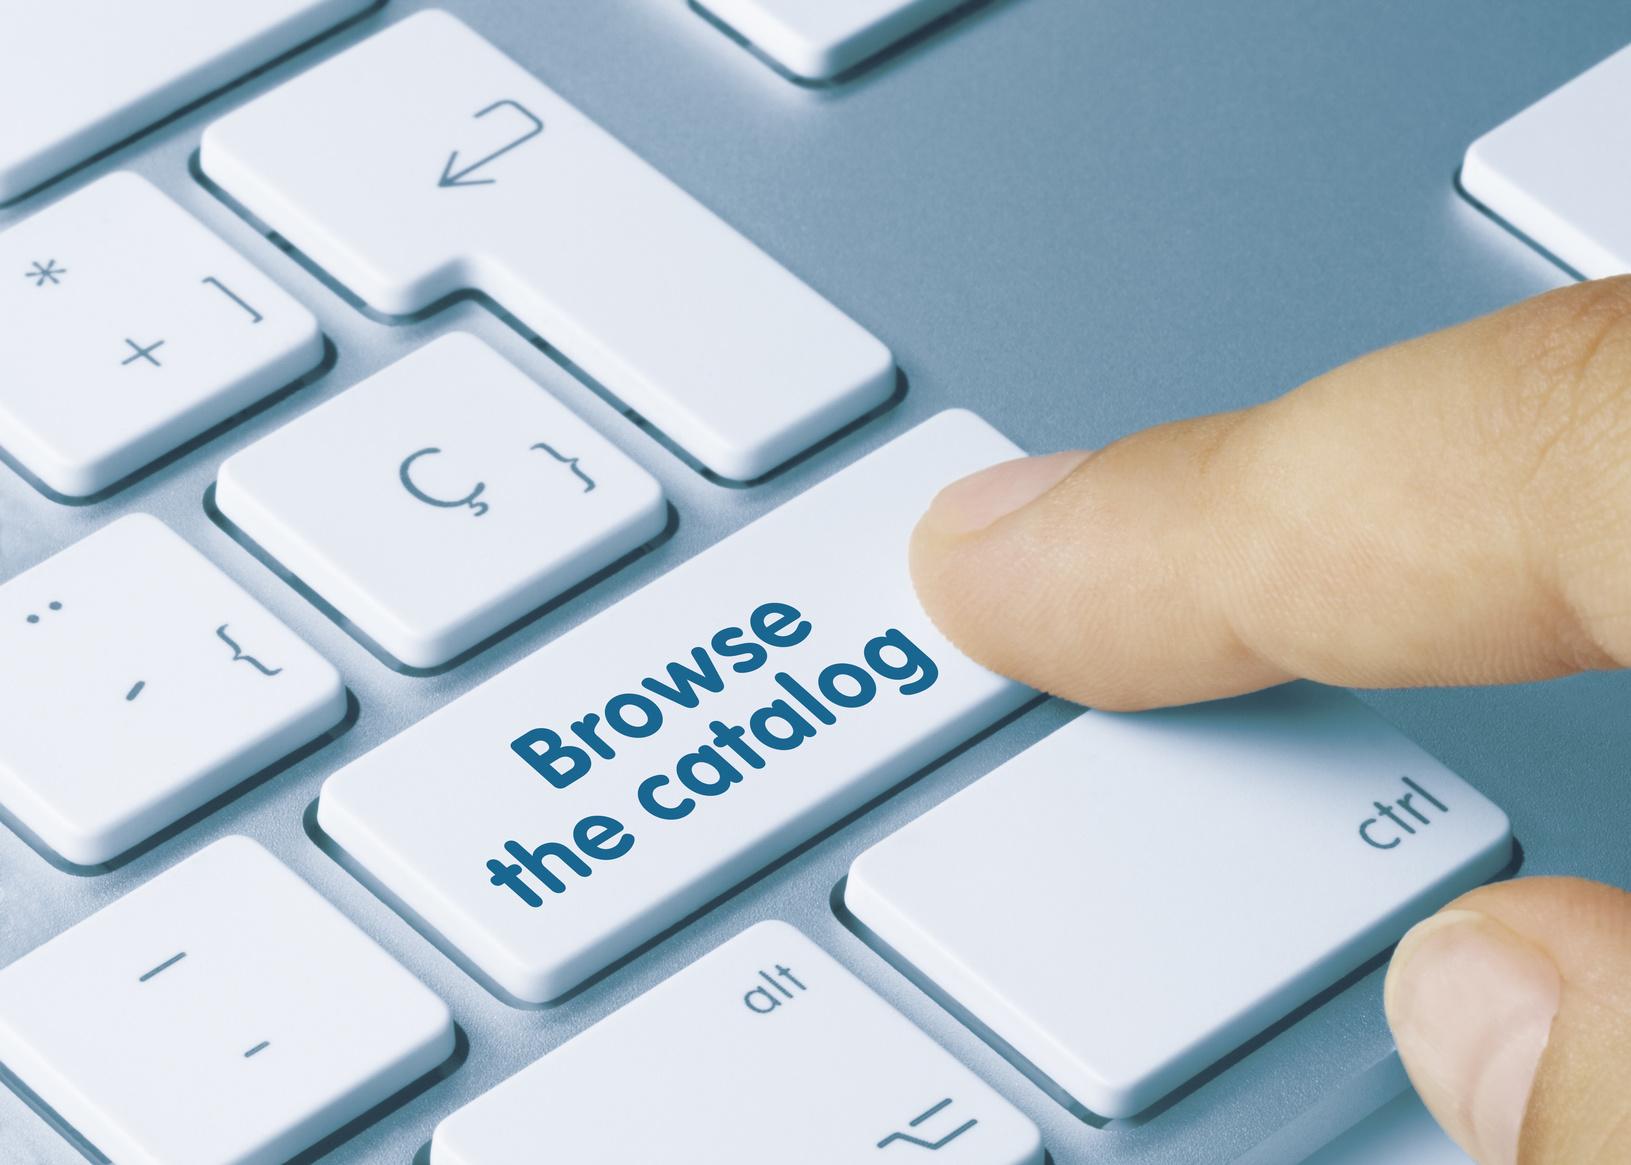 Creating a digital catalog